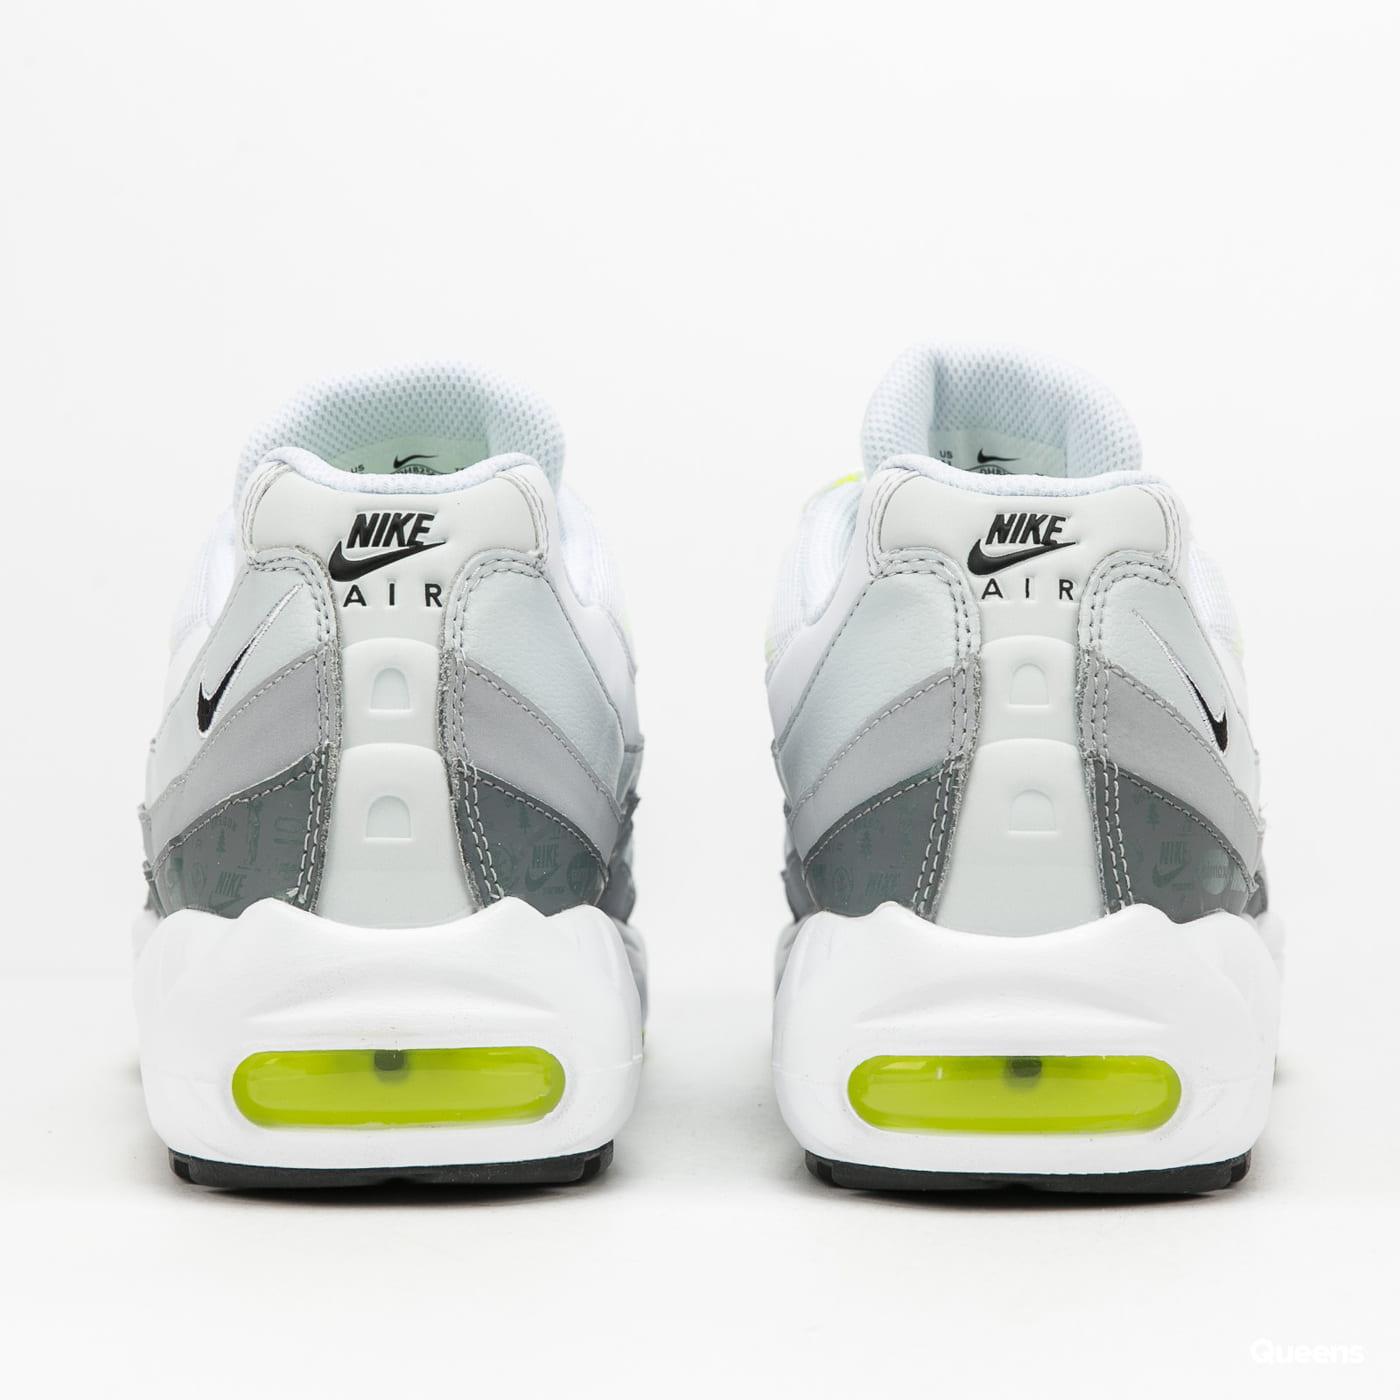 Nike Air Max 95 white / black - cool grey